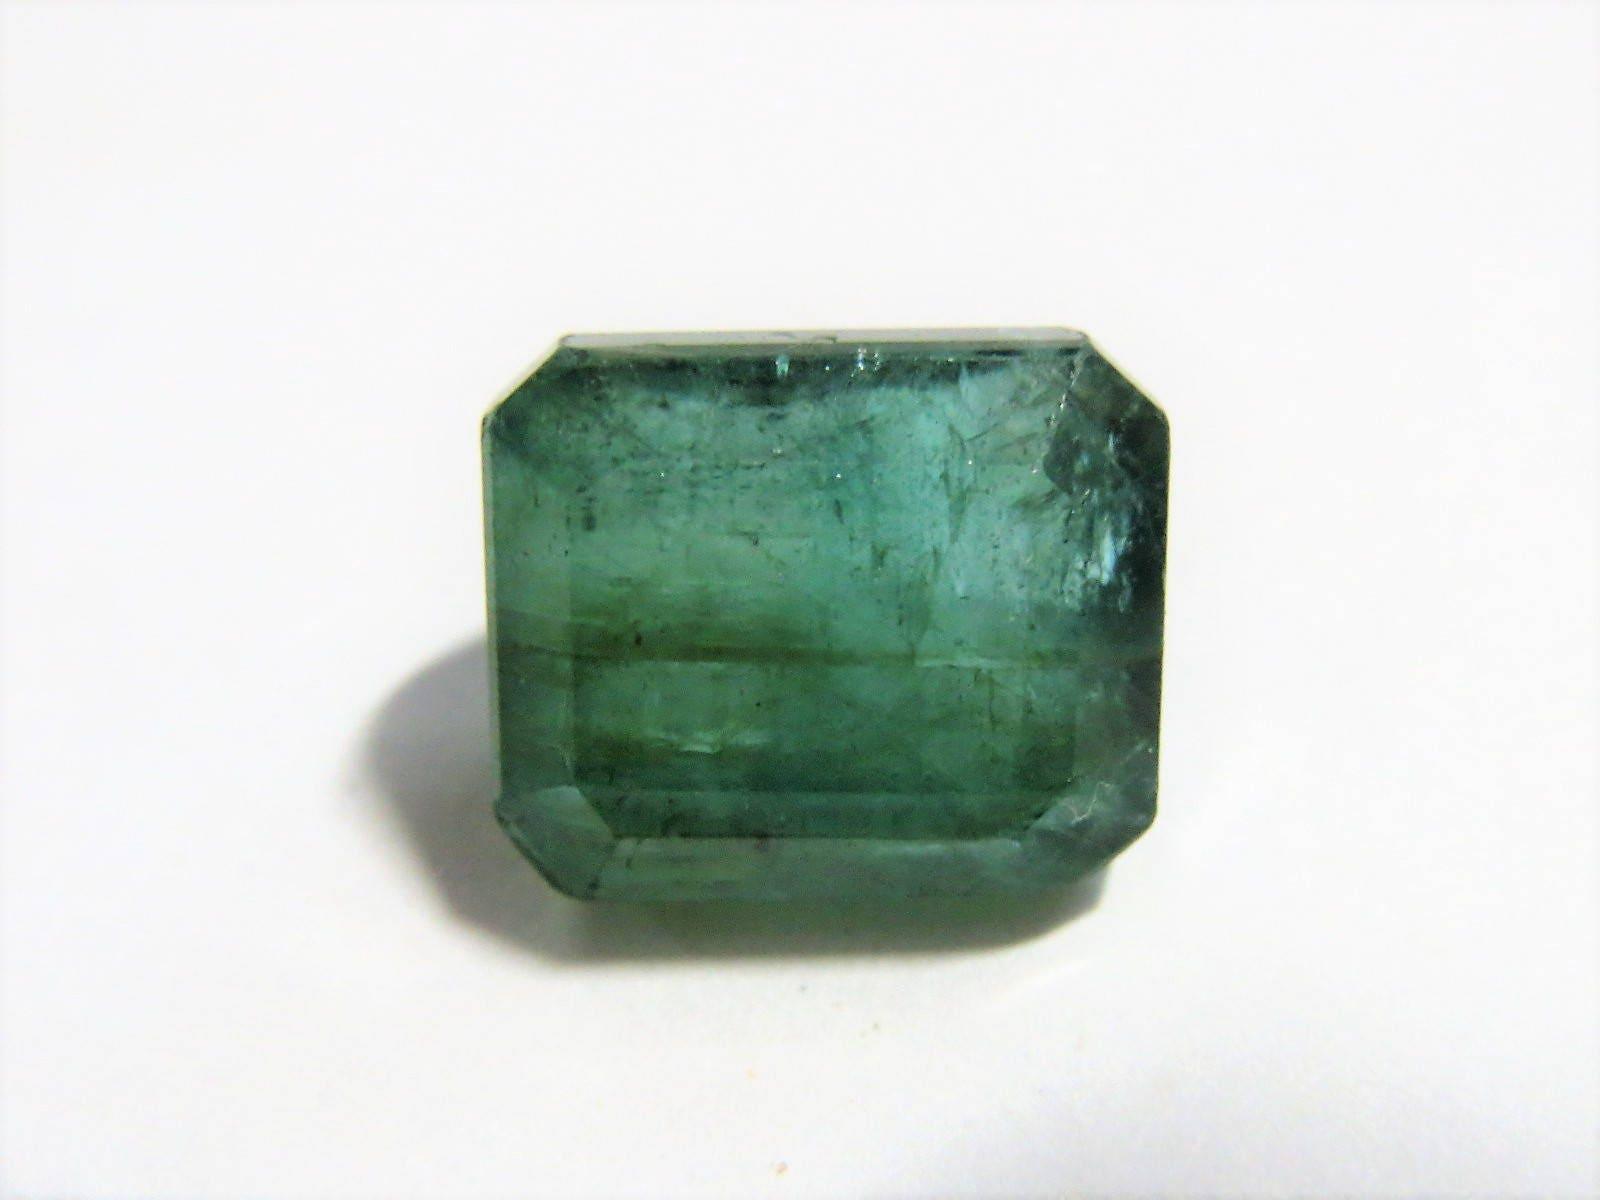 Large Zambian Emerald Loose Stone 7 5 Cts Natural